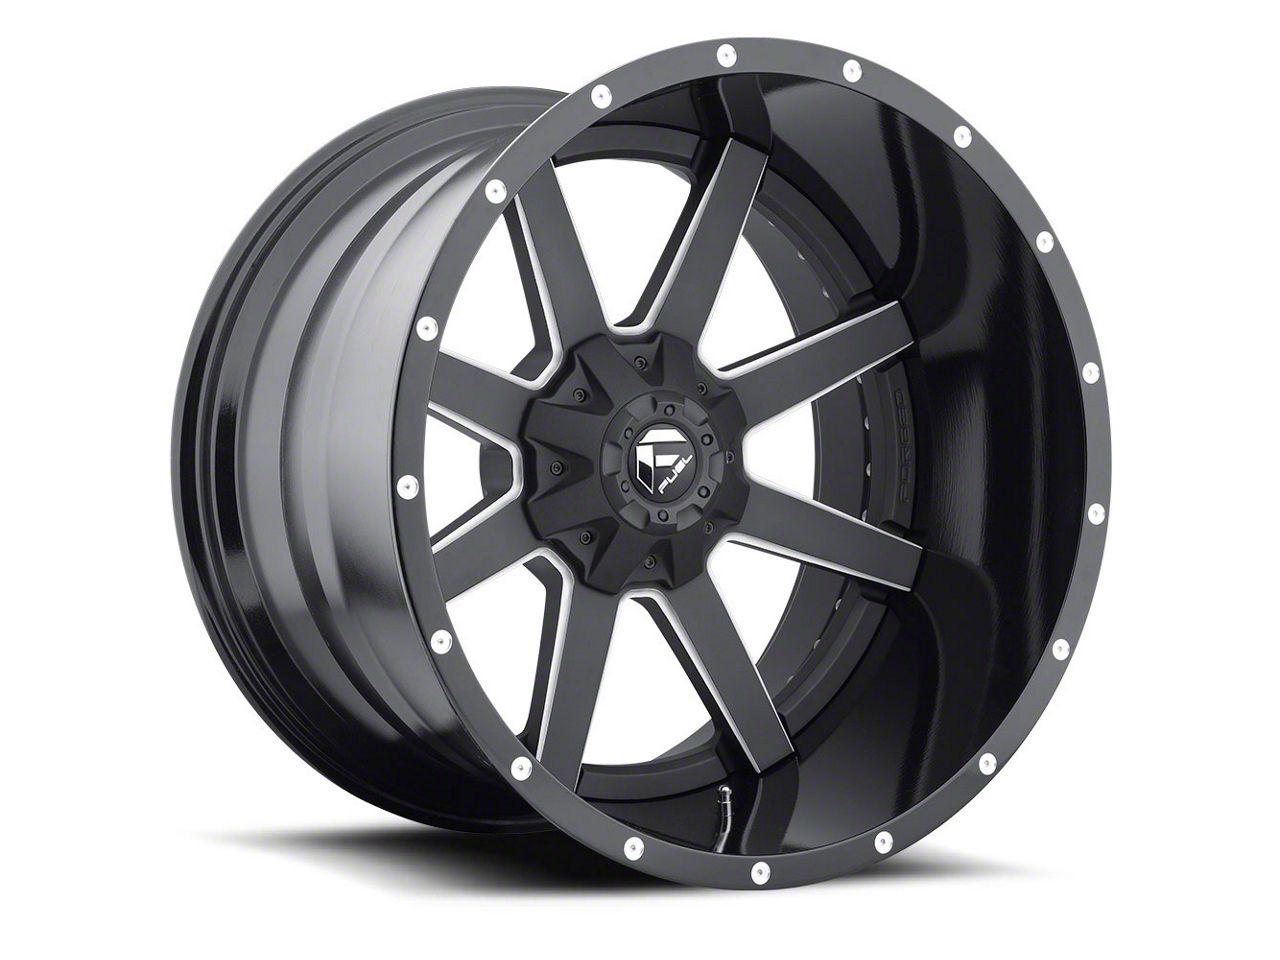 Fuel Wheels Maverick 2-Piece Black Milled 6-Lug Wheel - 24x14 (07-18 Sierra 1500)